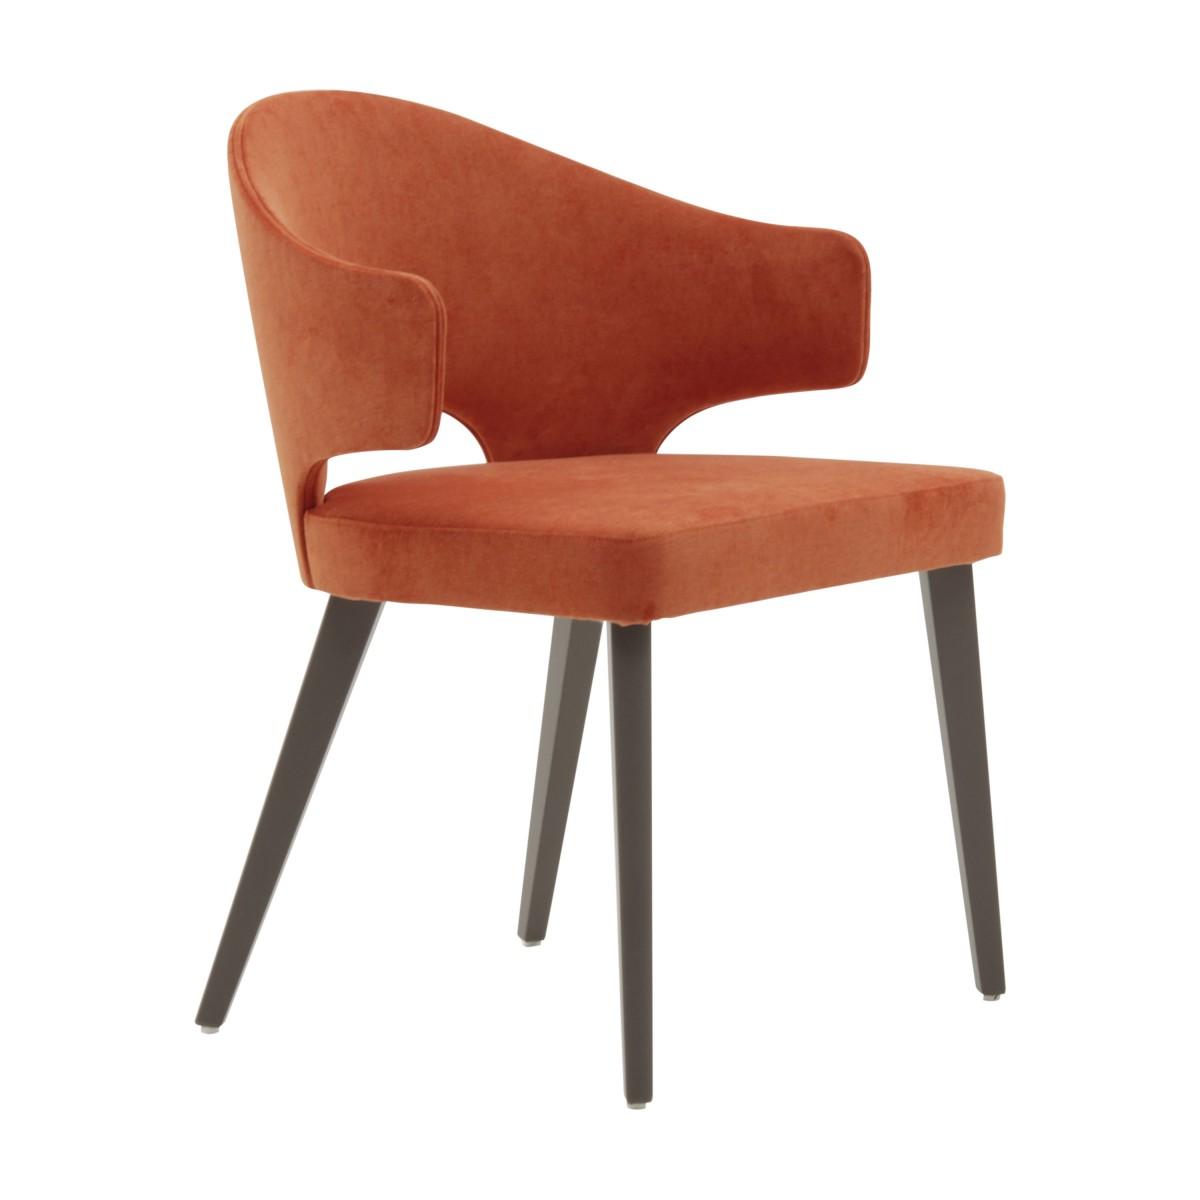 contemporary italian wood orange armchair eva 9781